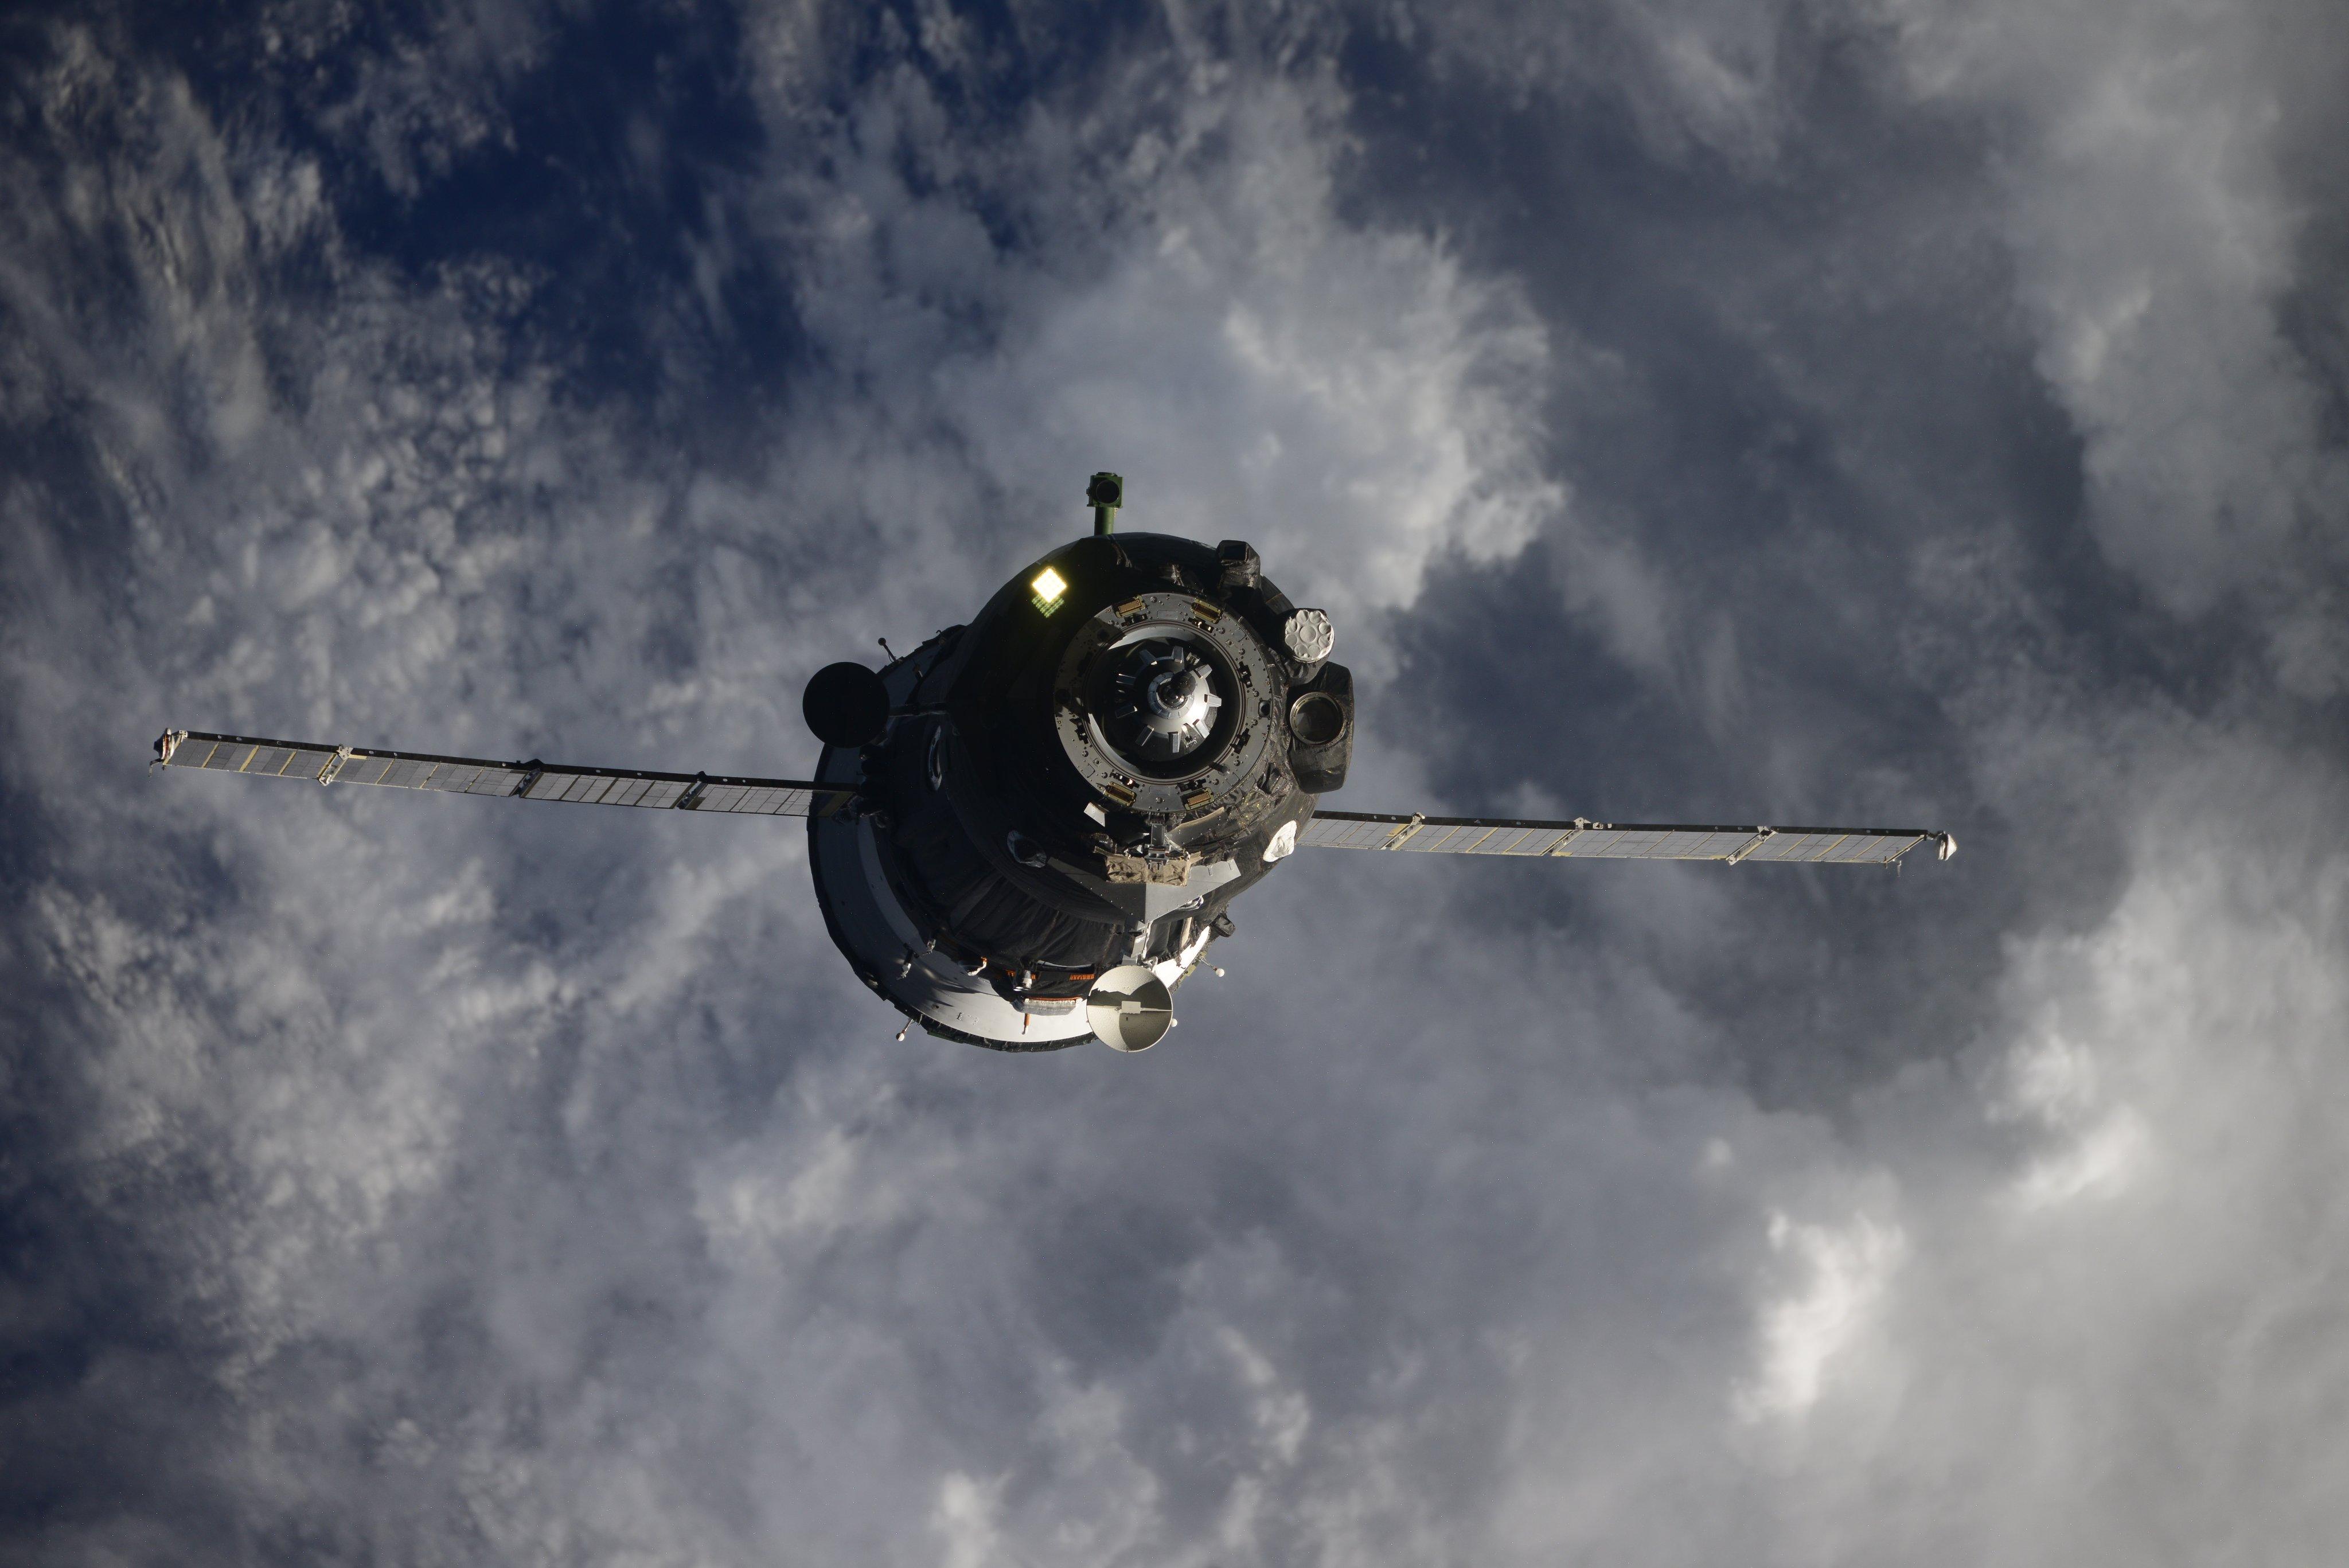 Союз МС 17, фото Ивана Вагнера